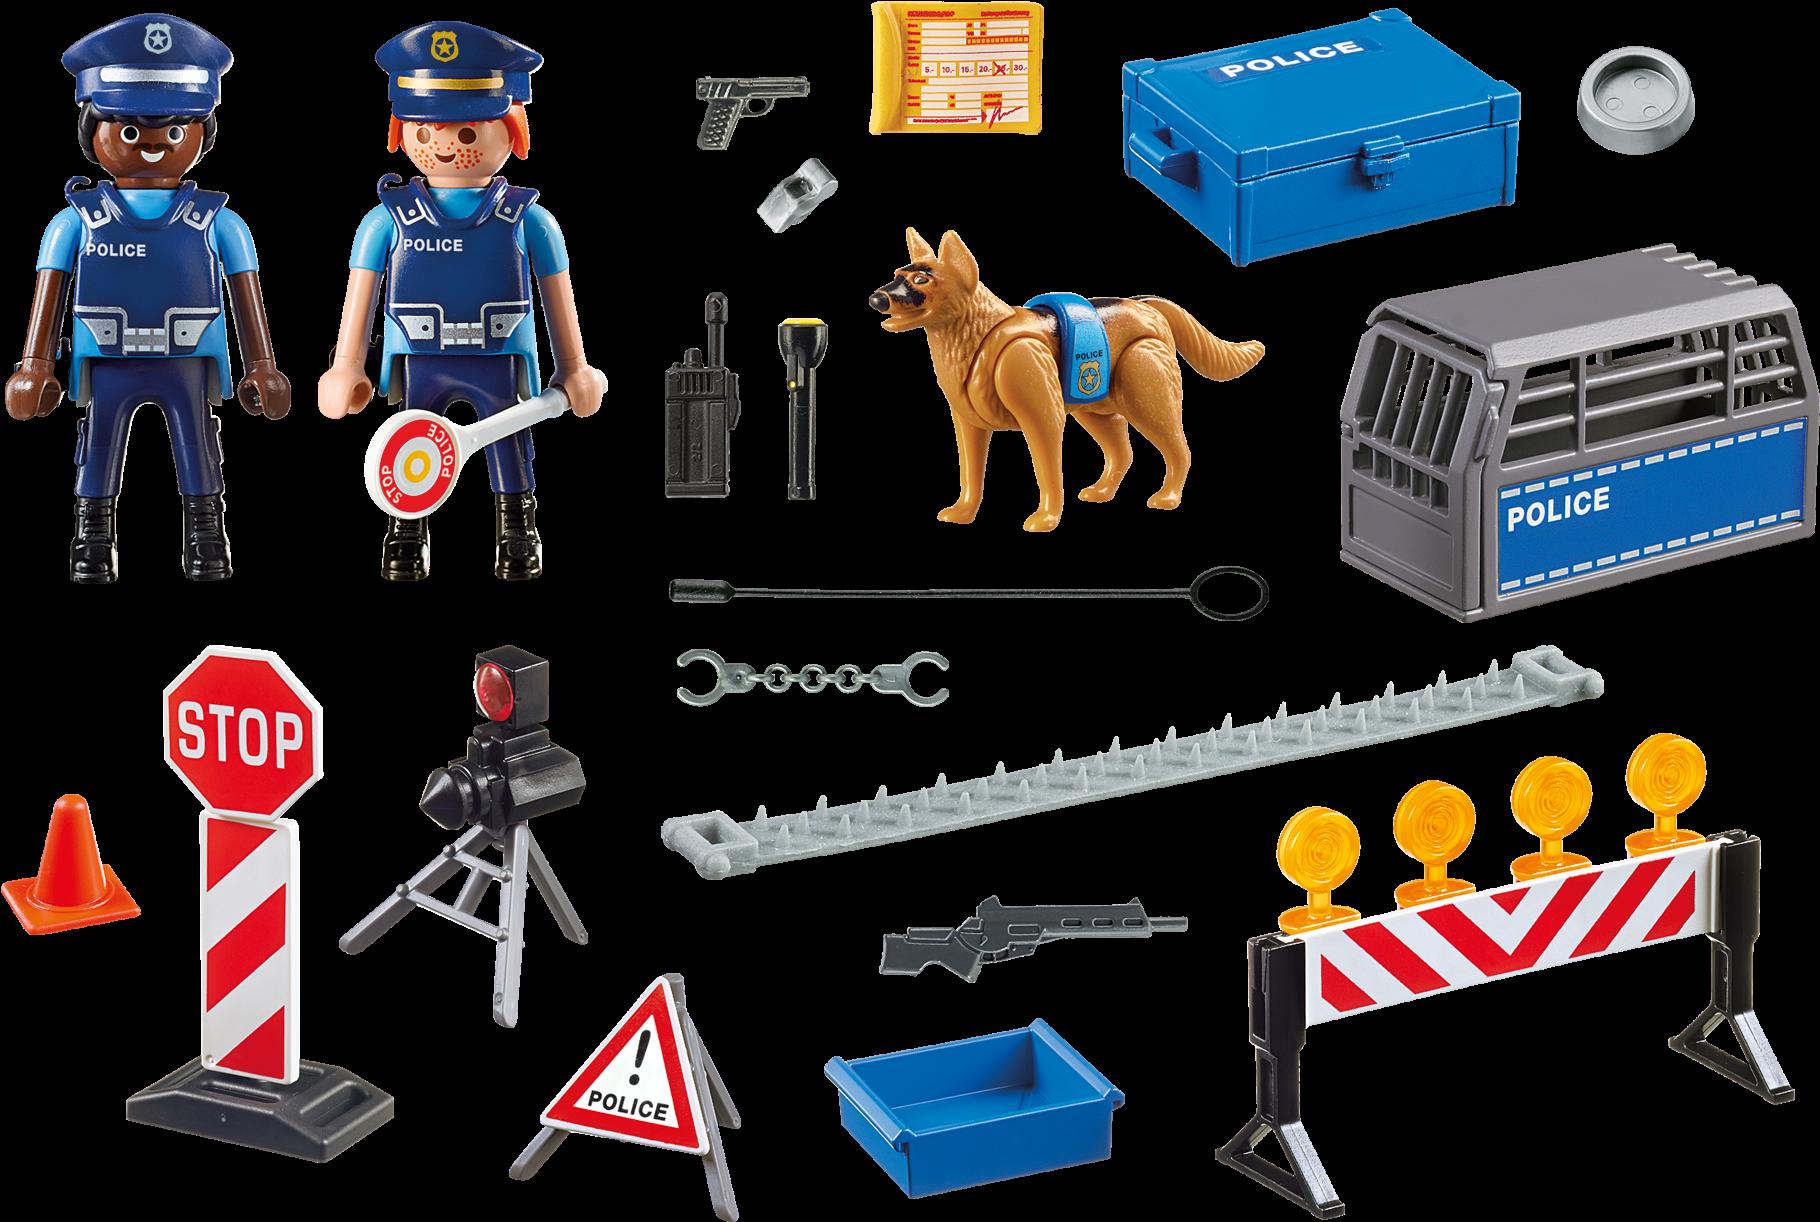 Playmobil 6924 Police Roadblock